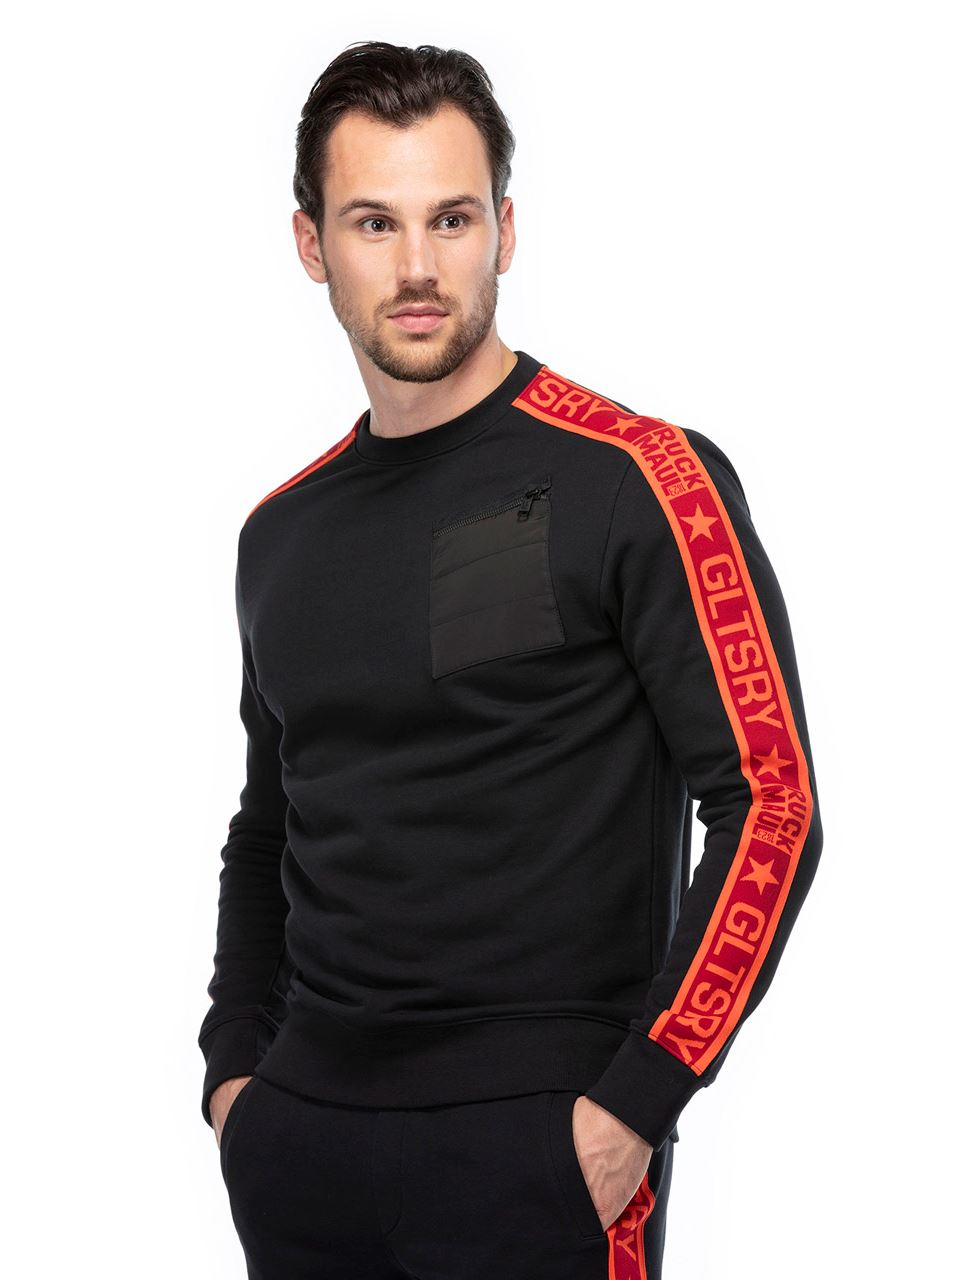 Ruck & Maul Erkek Sweatshirt 21175